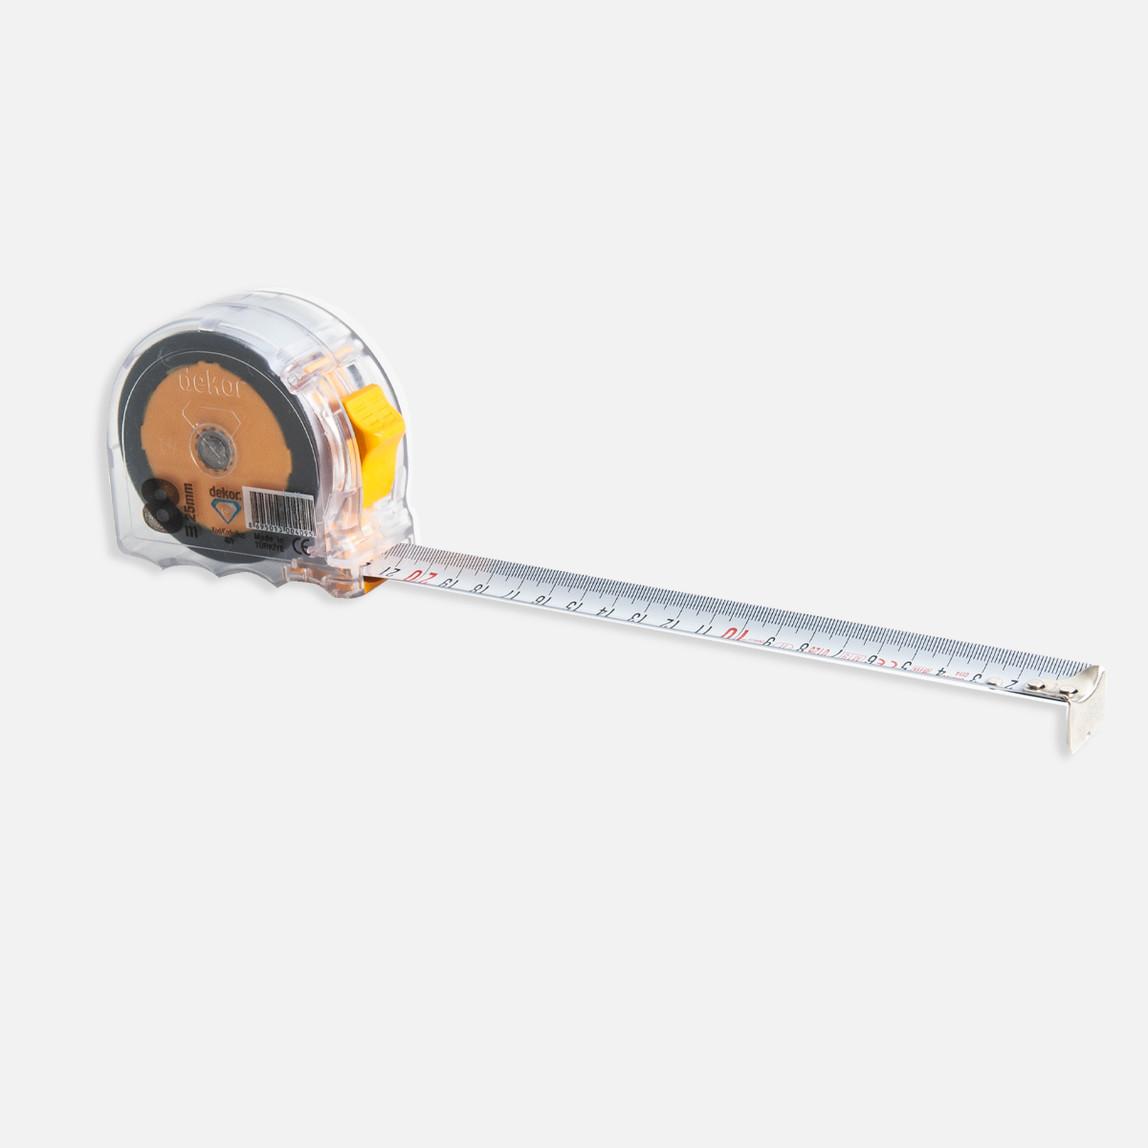 Dekor 8Mx25 mm Şerit Metre Şeffaf